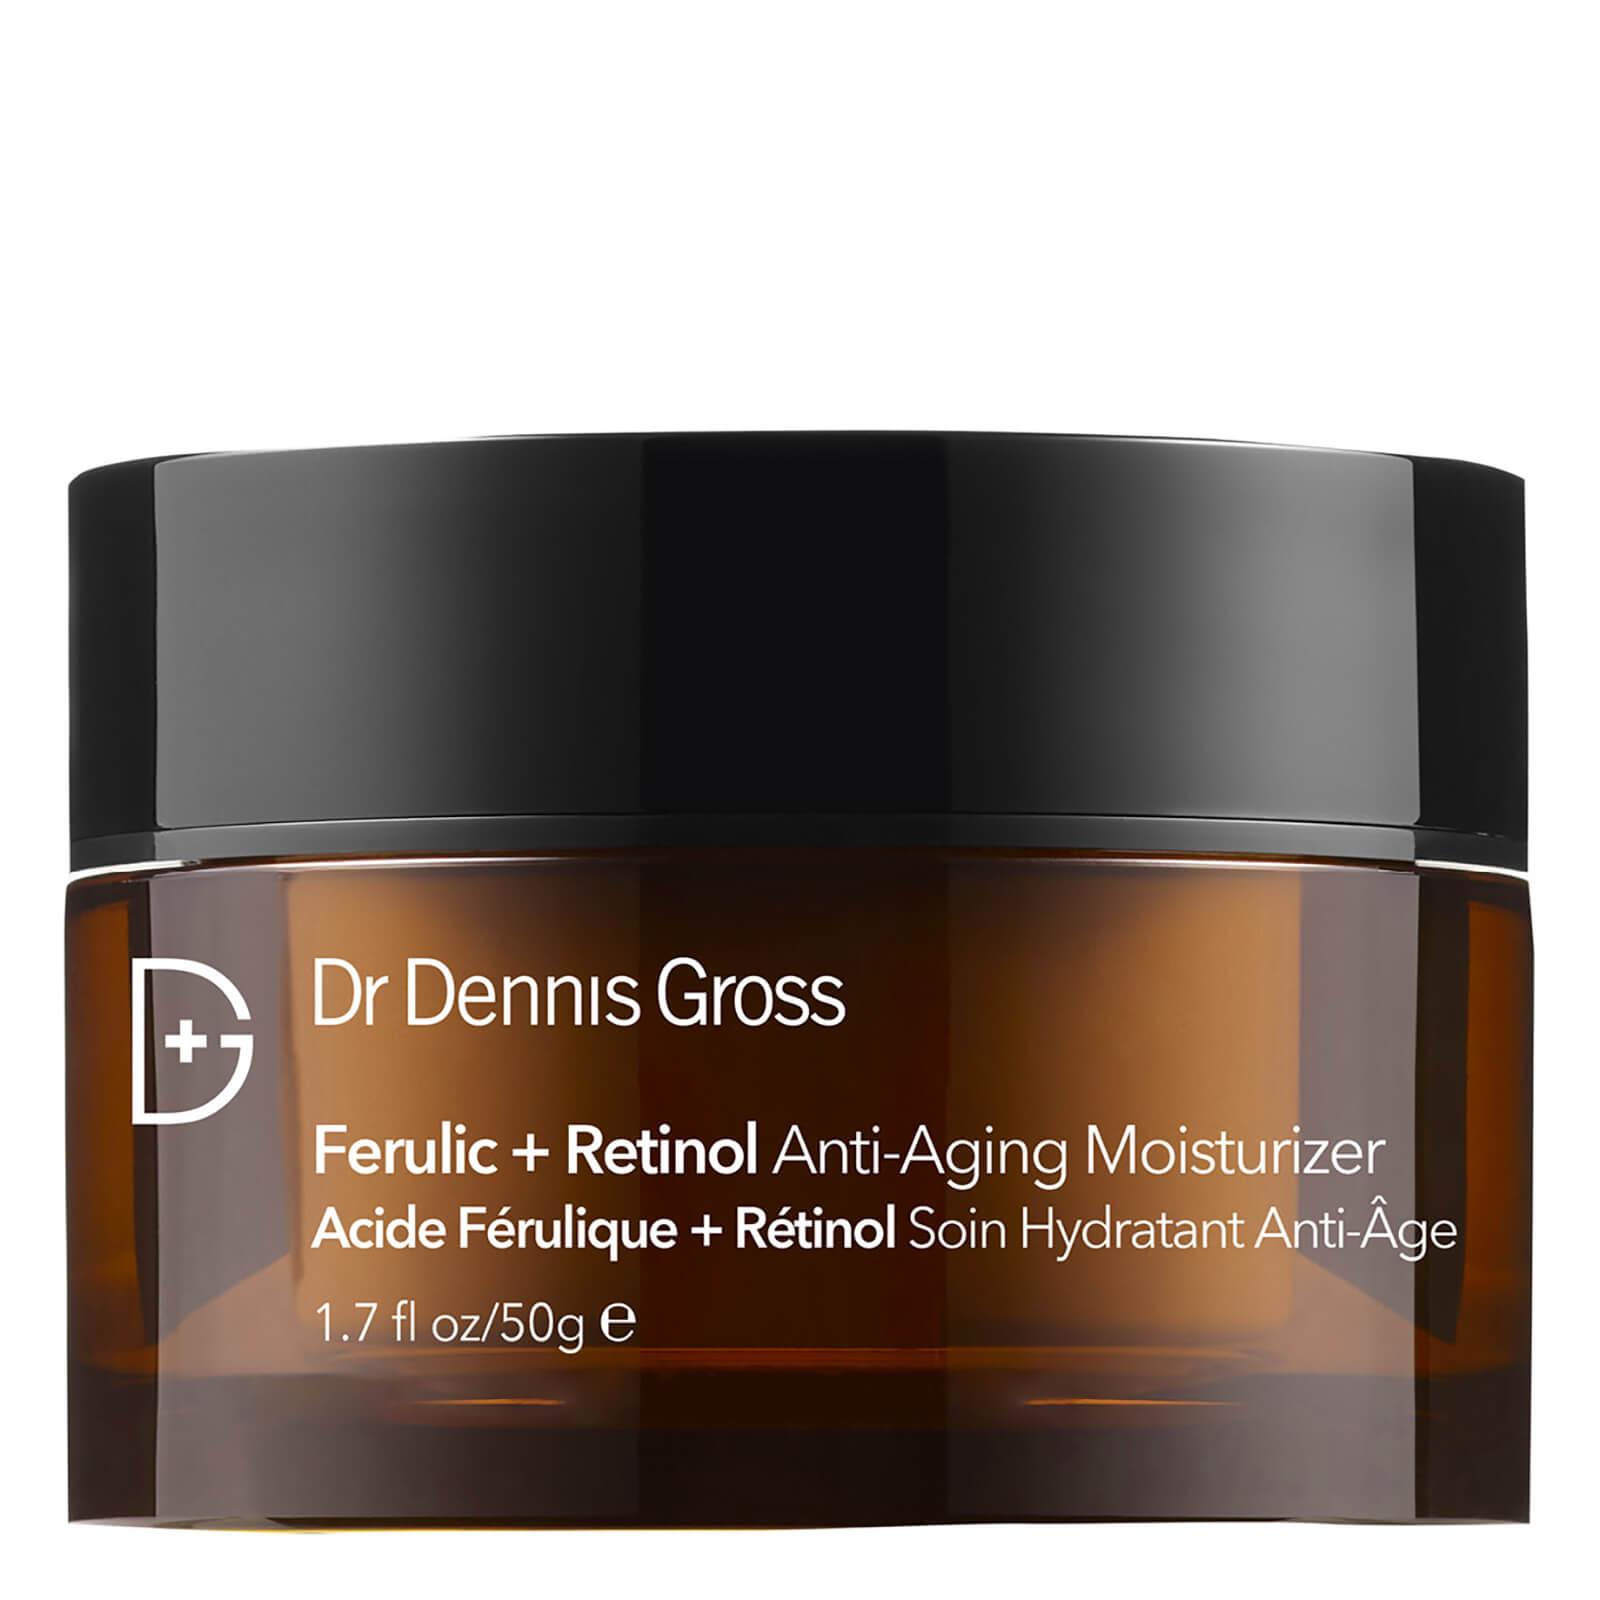 Dr Dennis Gross Skincare Ferulic + Retinol Anti-Aging Moisturizer   Free US Shipping   lookfantastic